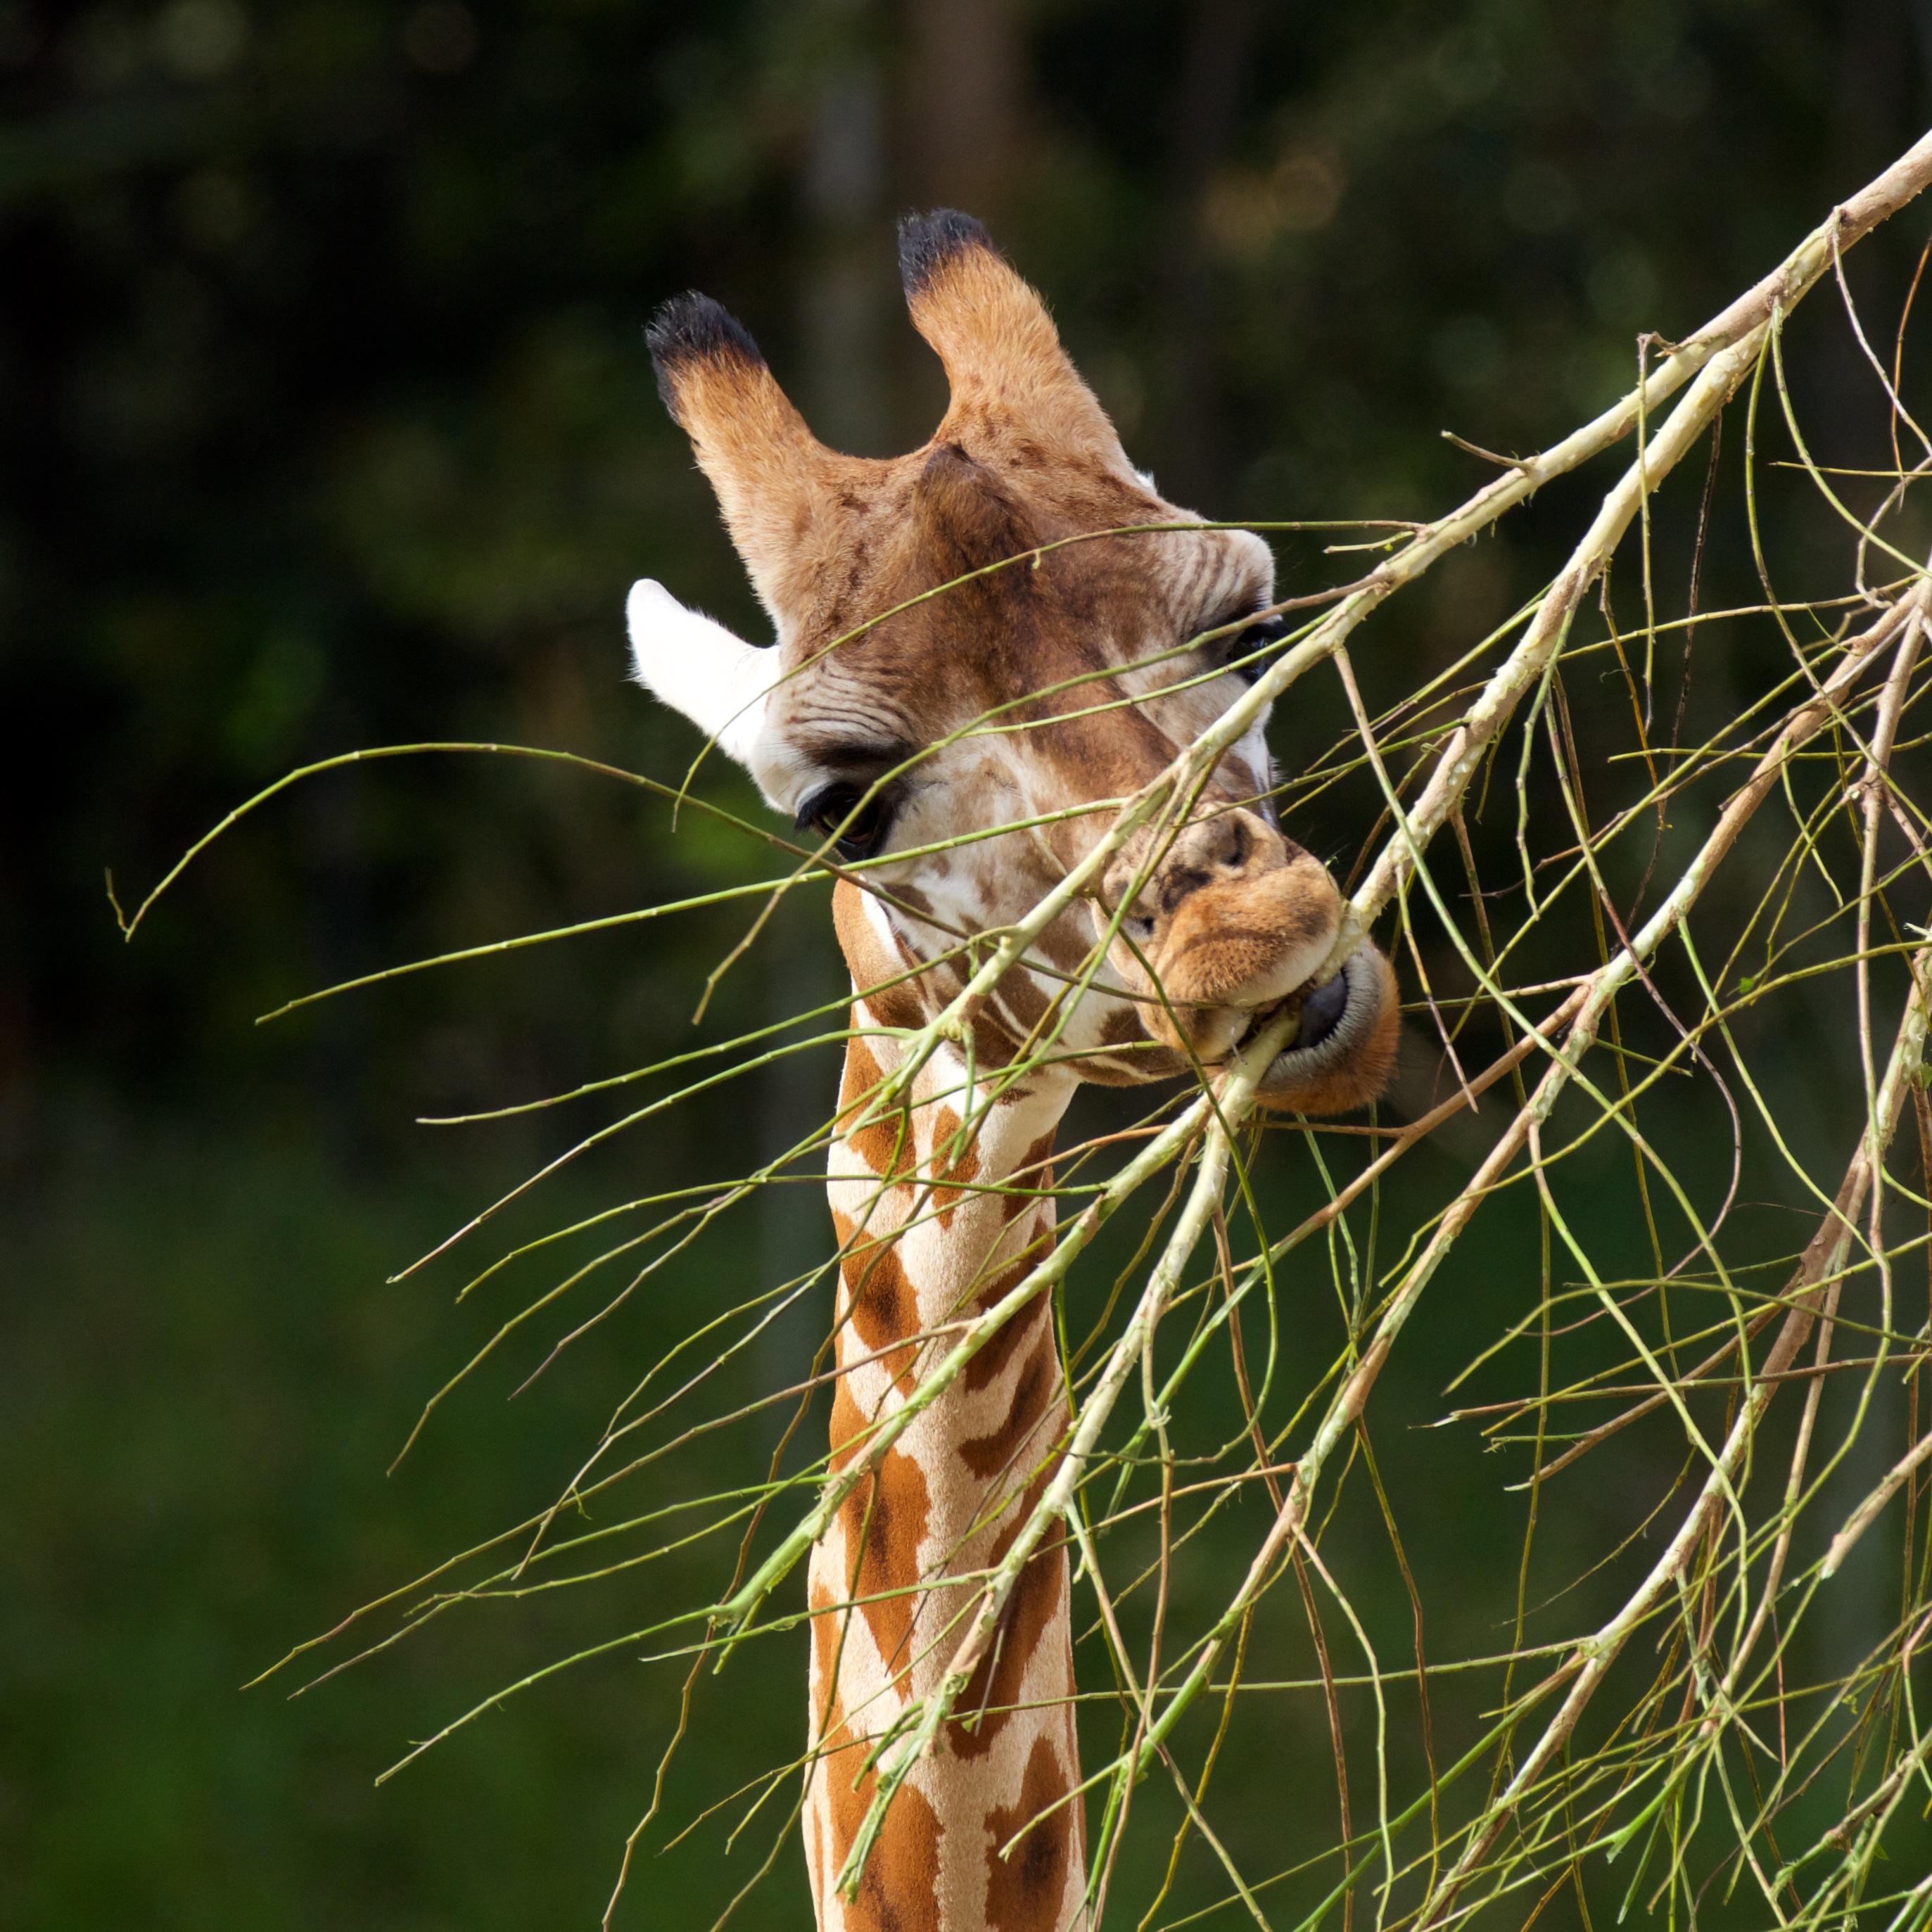 Giraffe nibbling bare branches